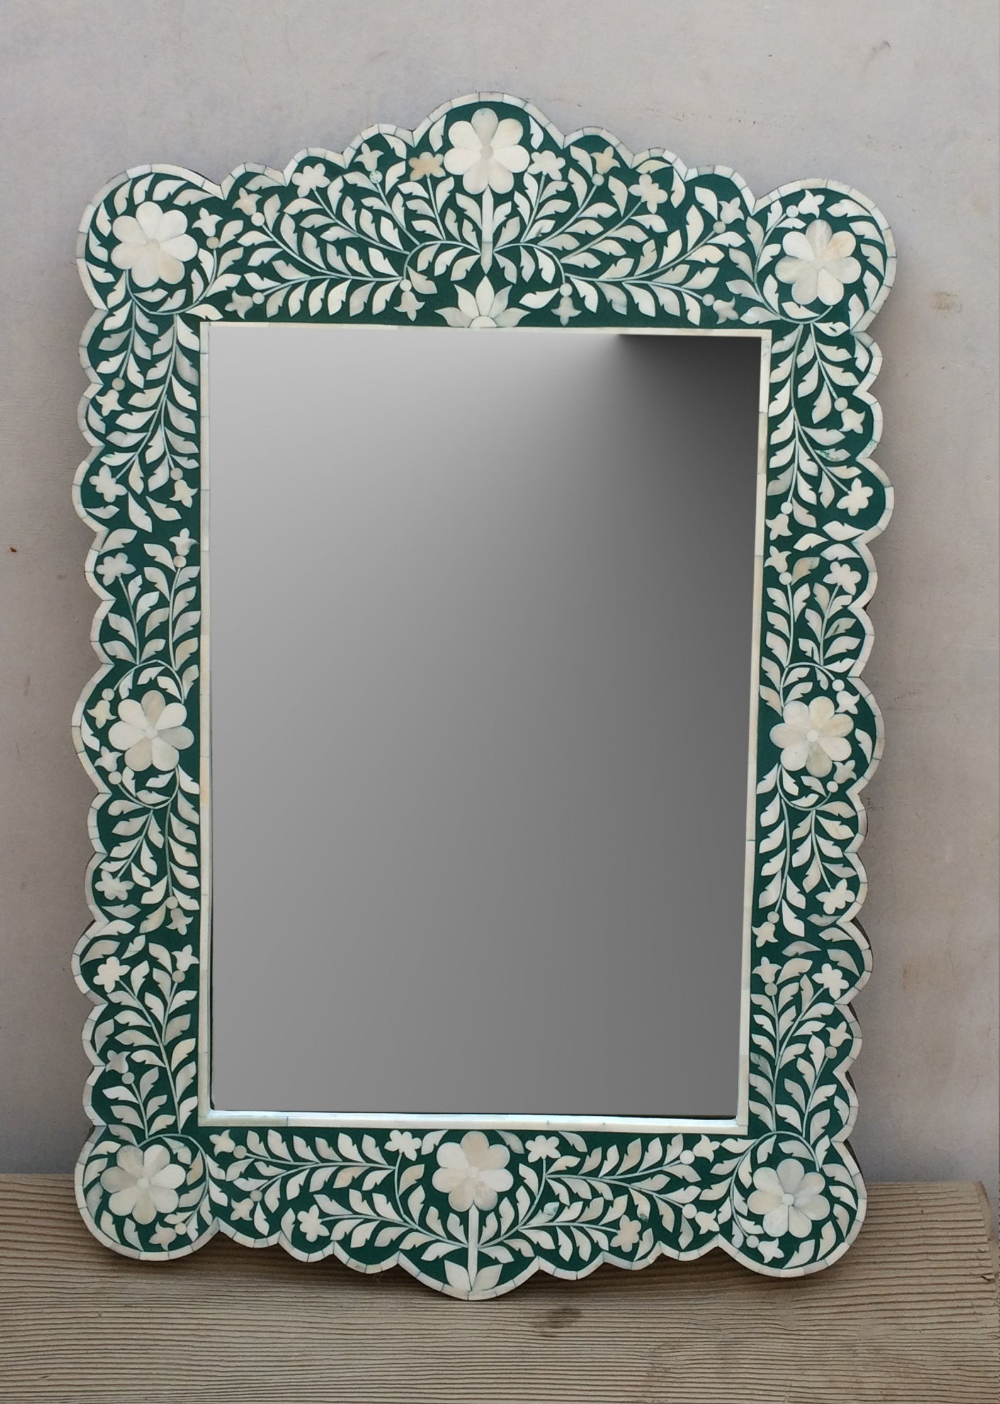 Handmade Bone Inlay Wooden Modern Floral Pattern Mirror Frame Etsy In 2020 Bone Inlay Mirror Hand Painted Mirrors Bone Inlay